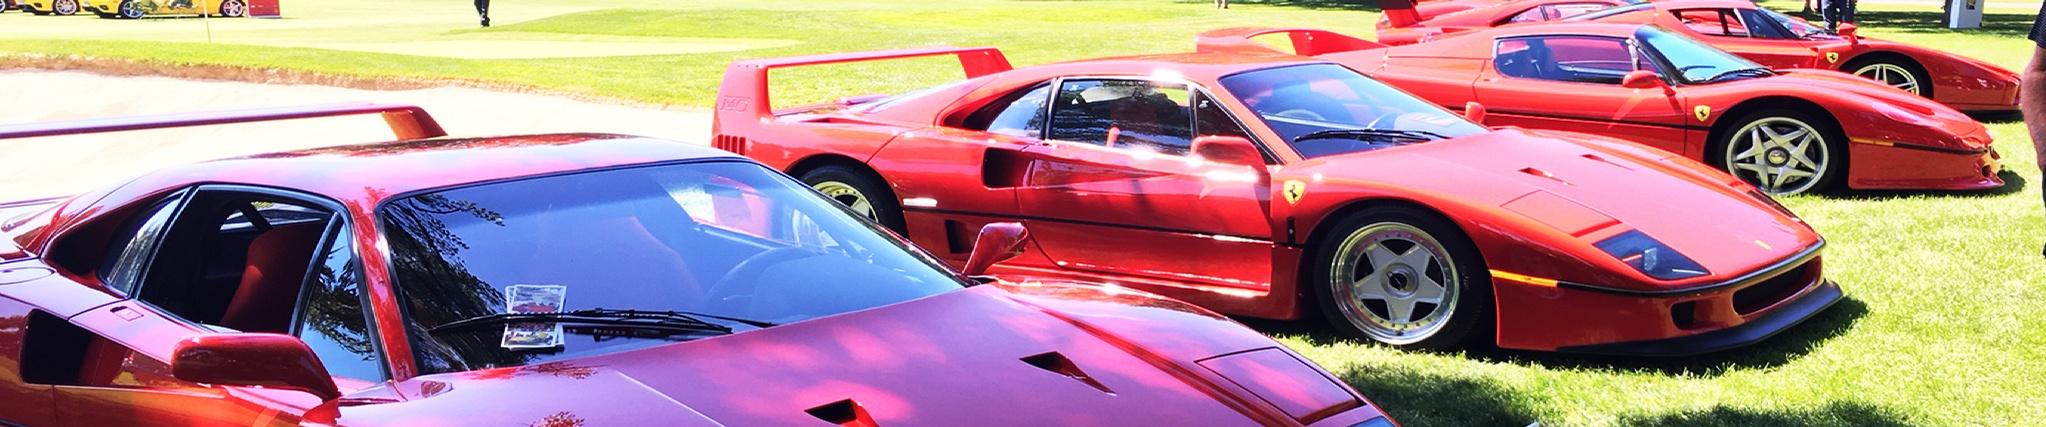 Ferrari Club Of America, Central States Region